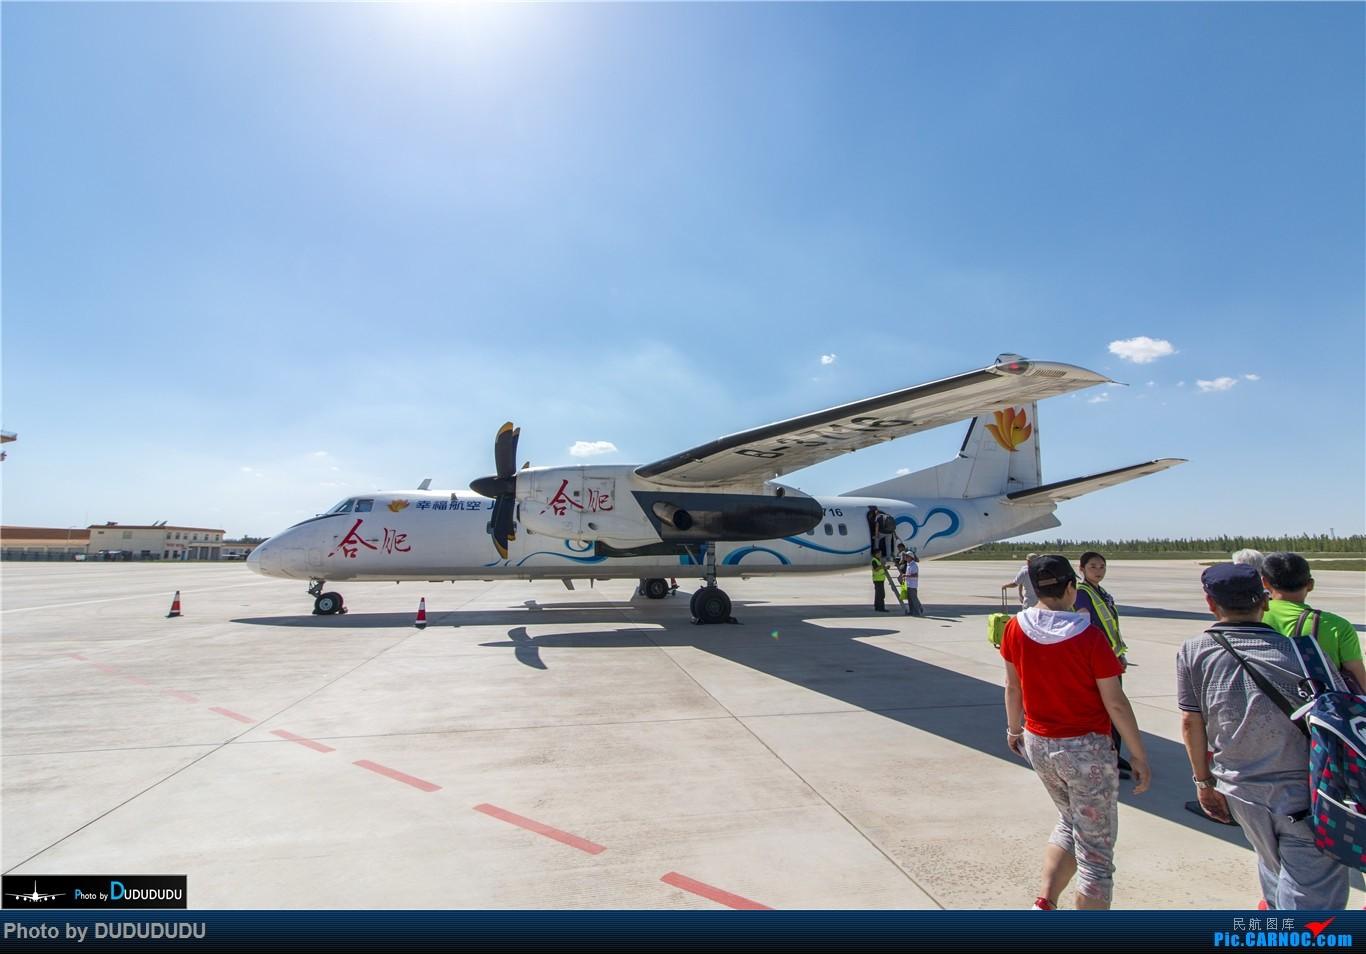 Re:[原创]【DUDUDUDU】暑期飞行合集 从A388到MA60 XIAN AIRCRAFT MA 60 B-3716 中国中卫沙坡头机场